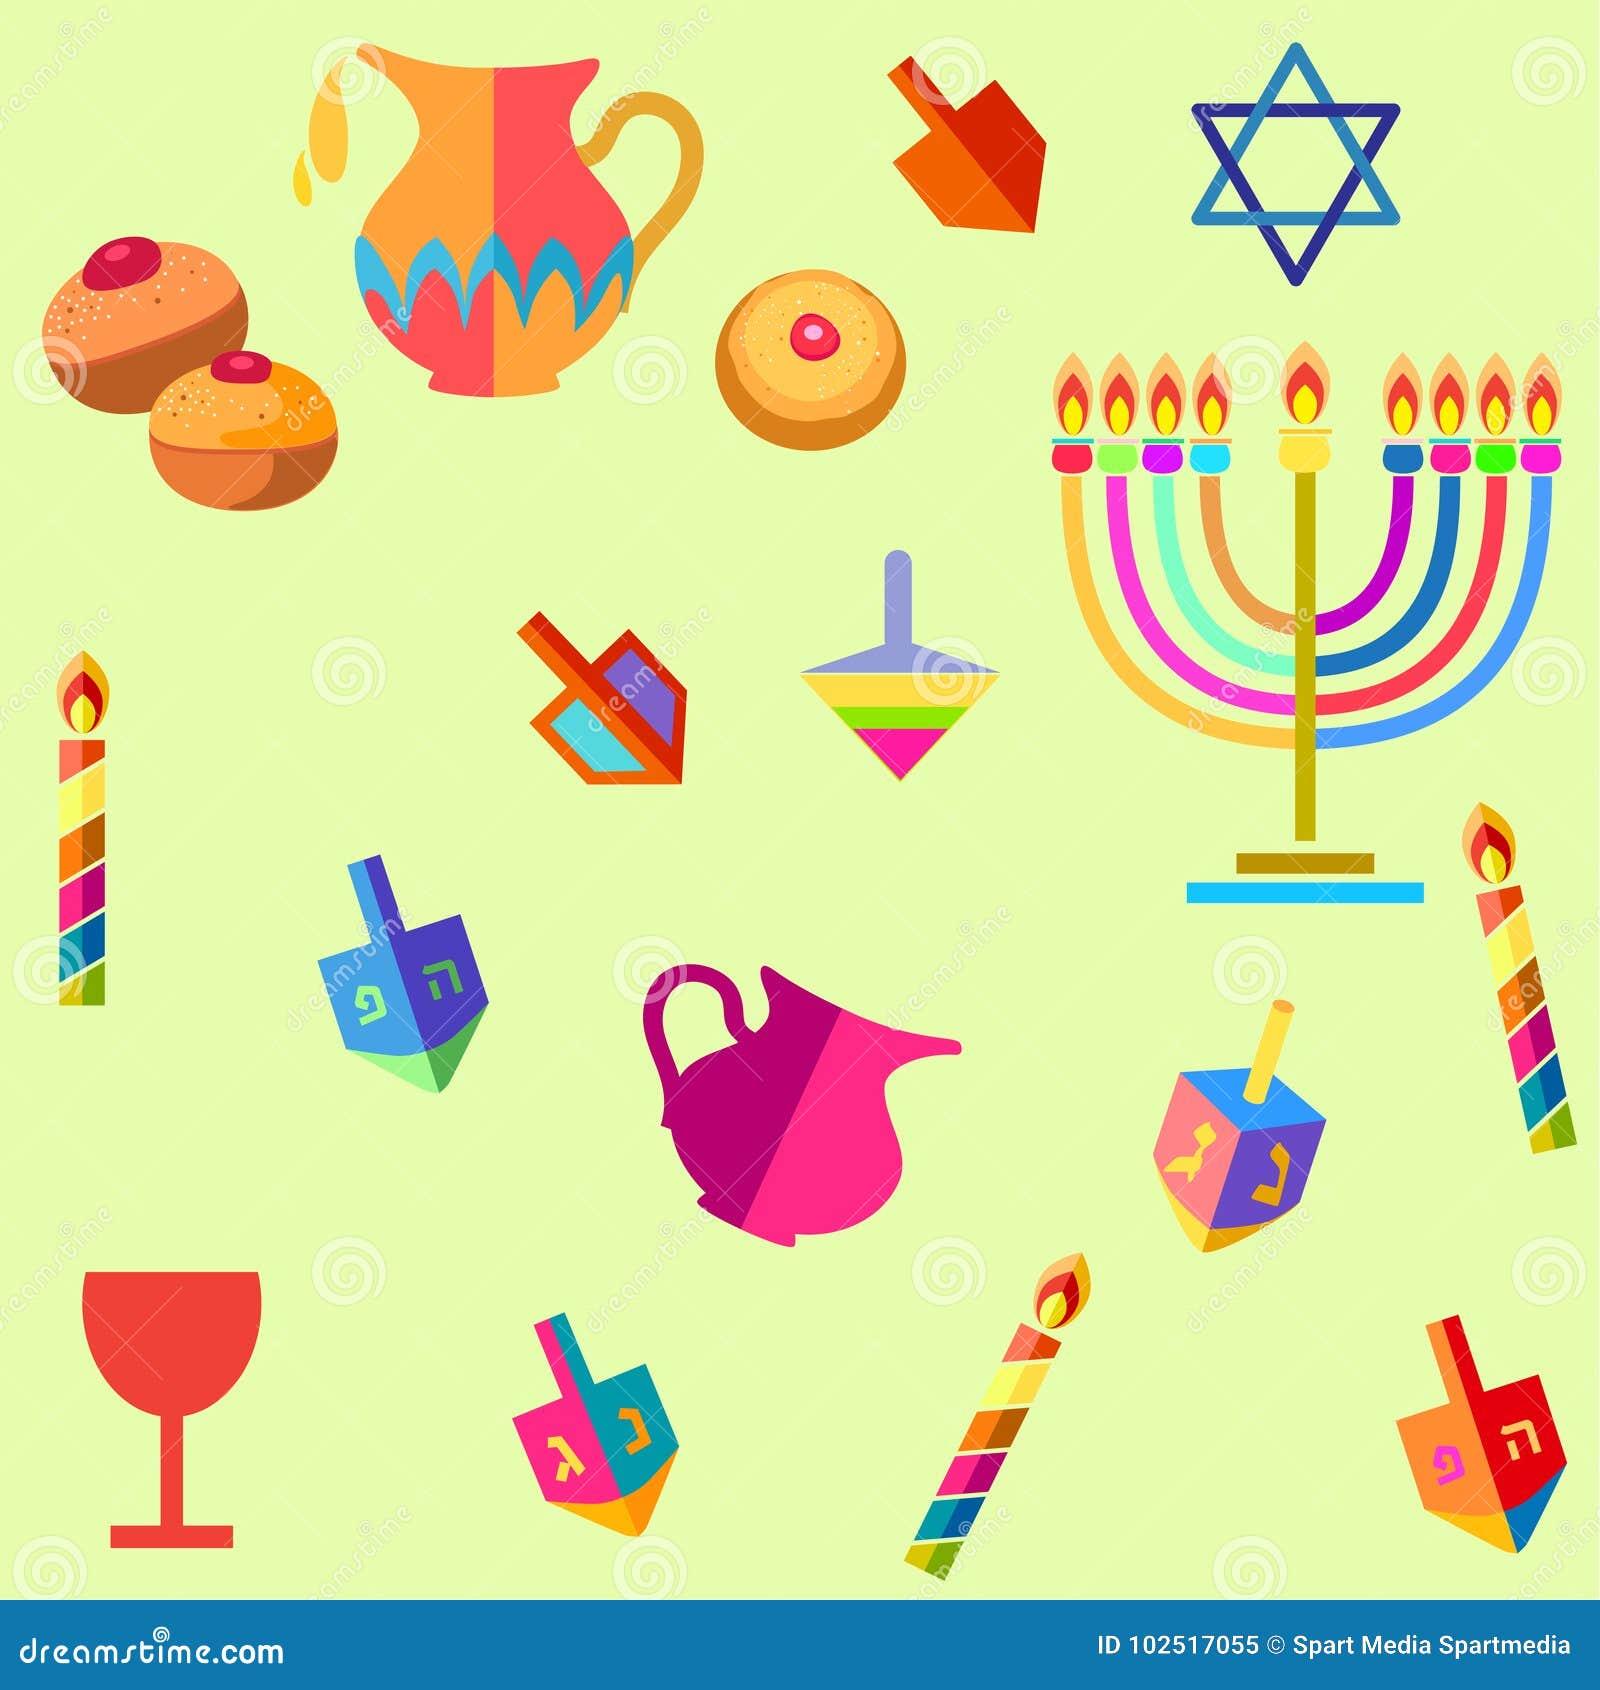 Hanukkah Symbols Stock Vector Illustration Of Candles 102517055